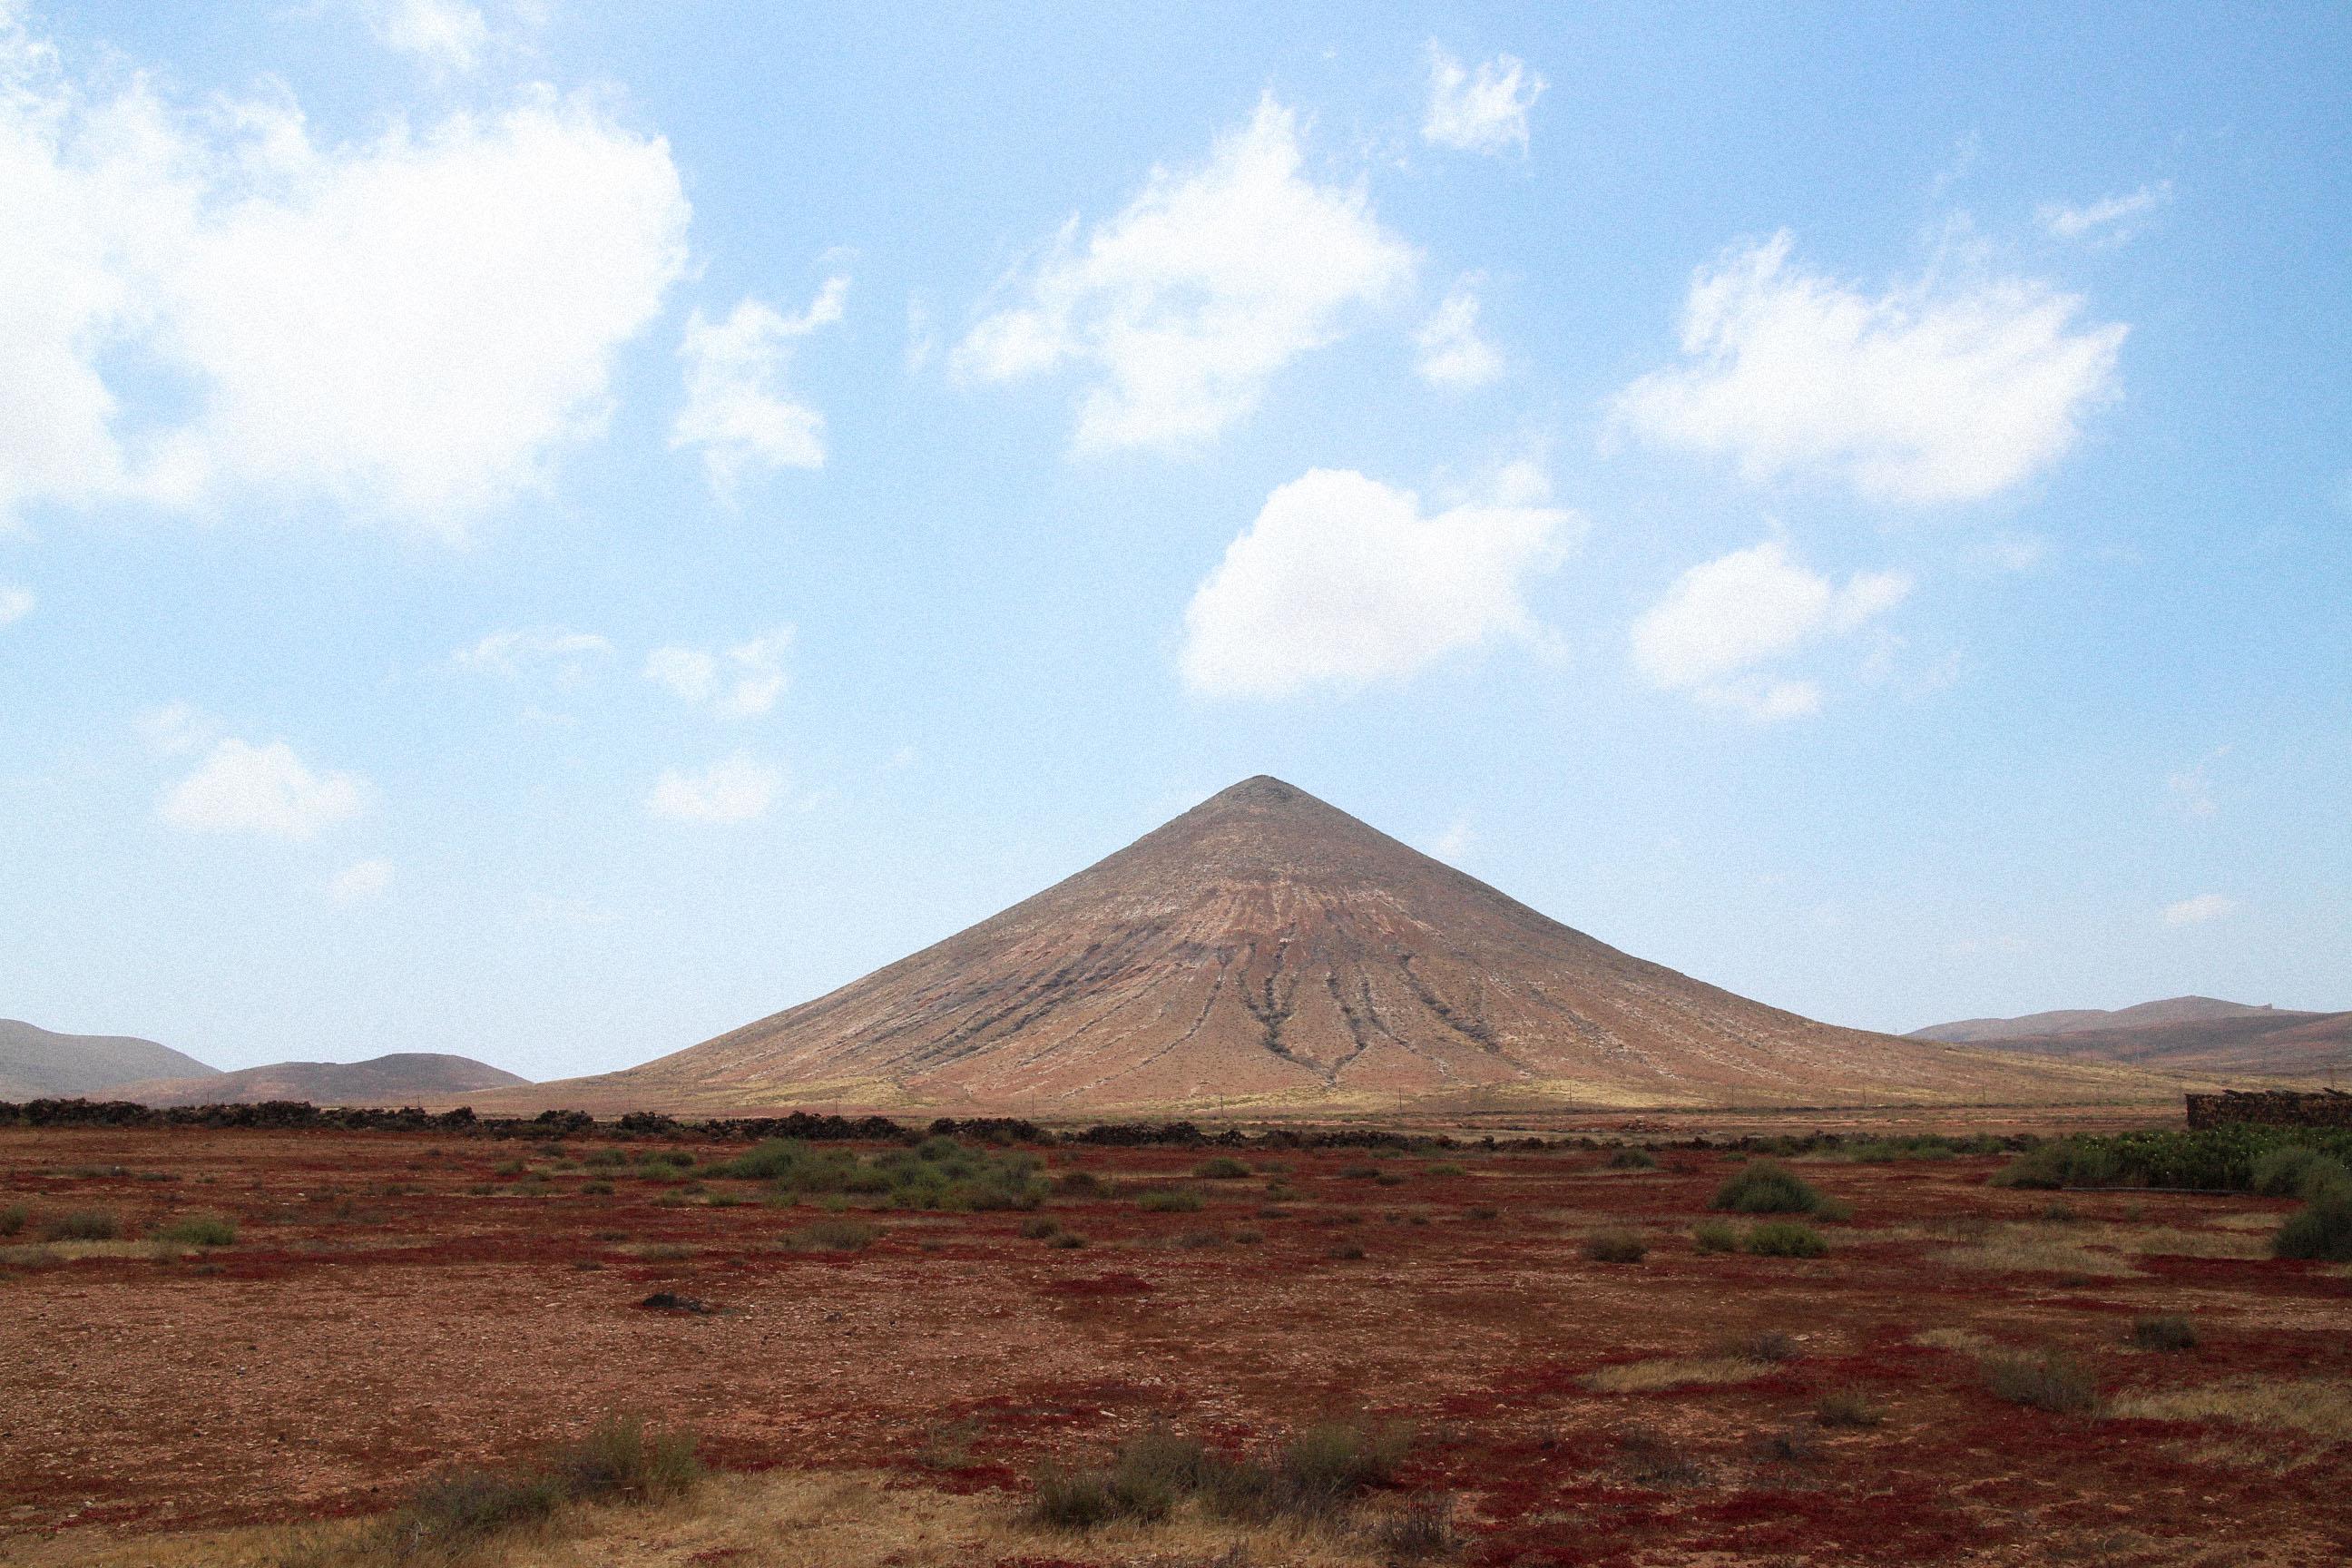 IHEARTALICE_Fuerteventura_09